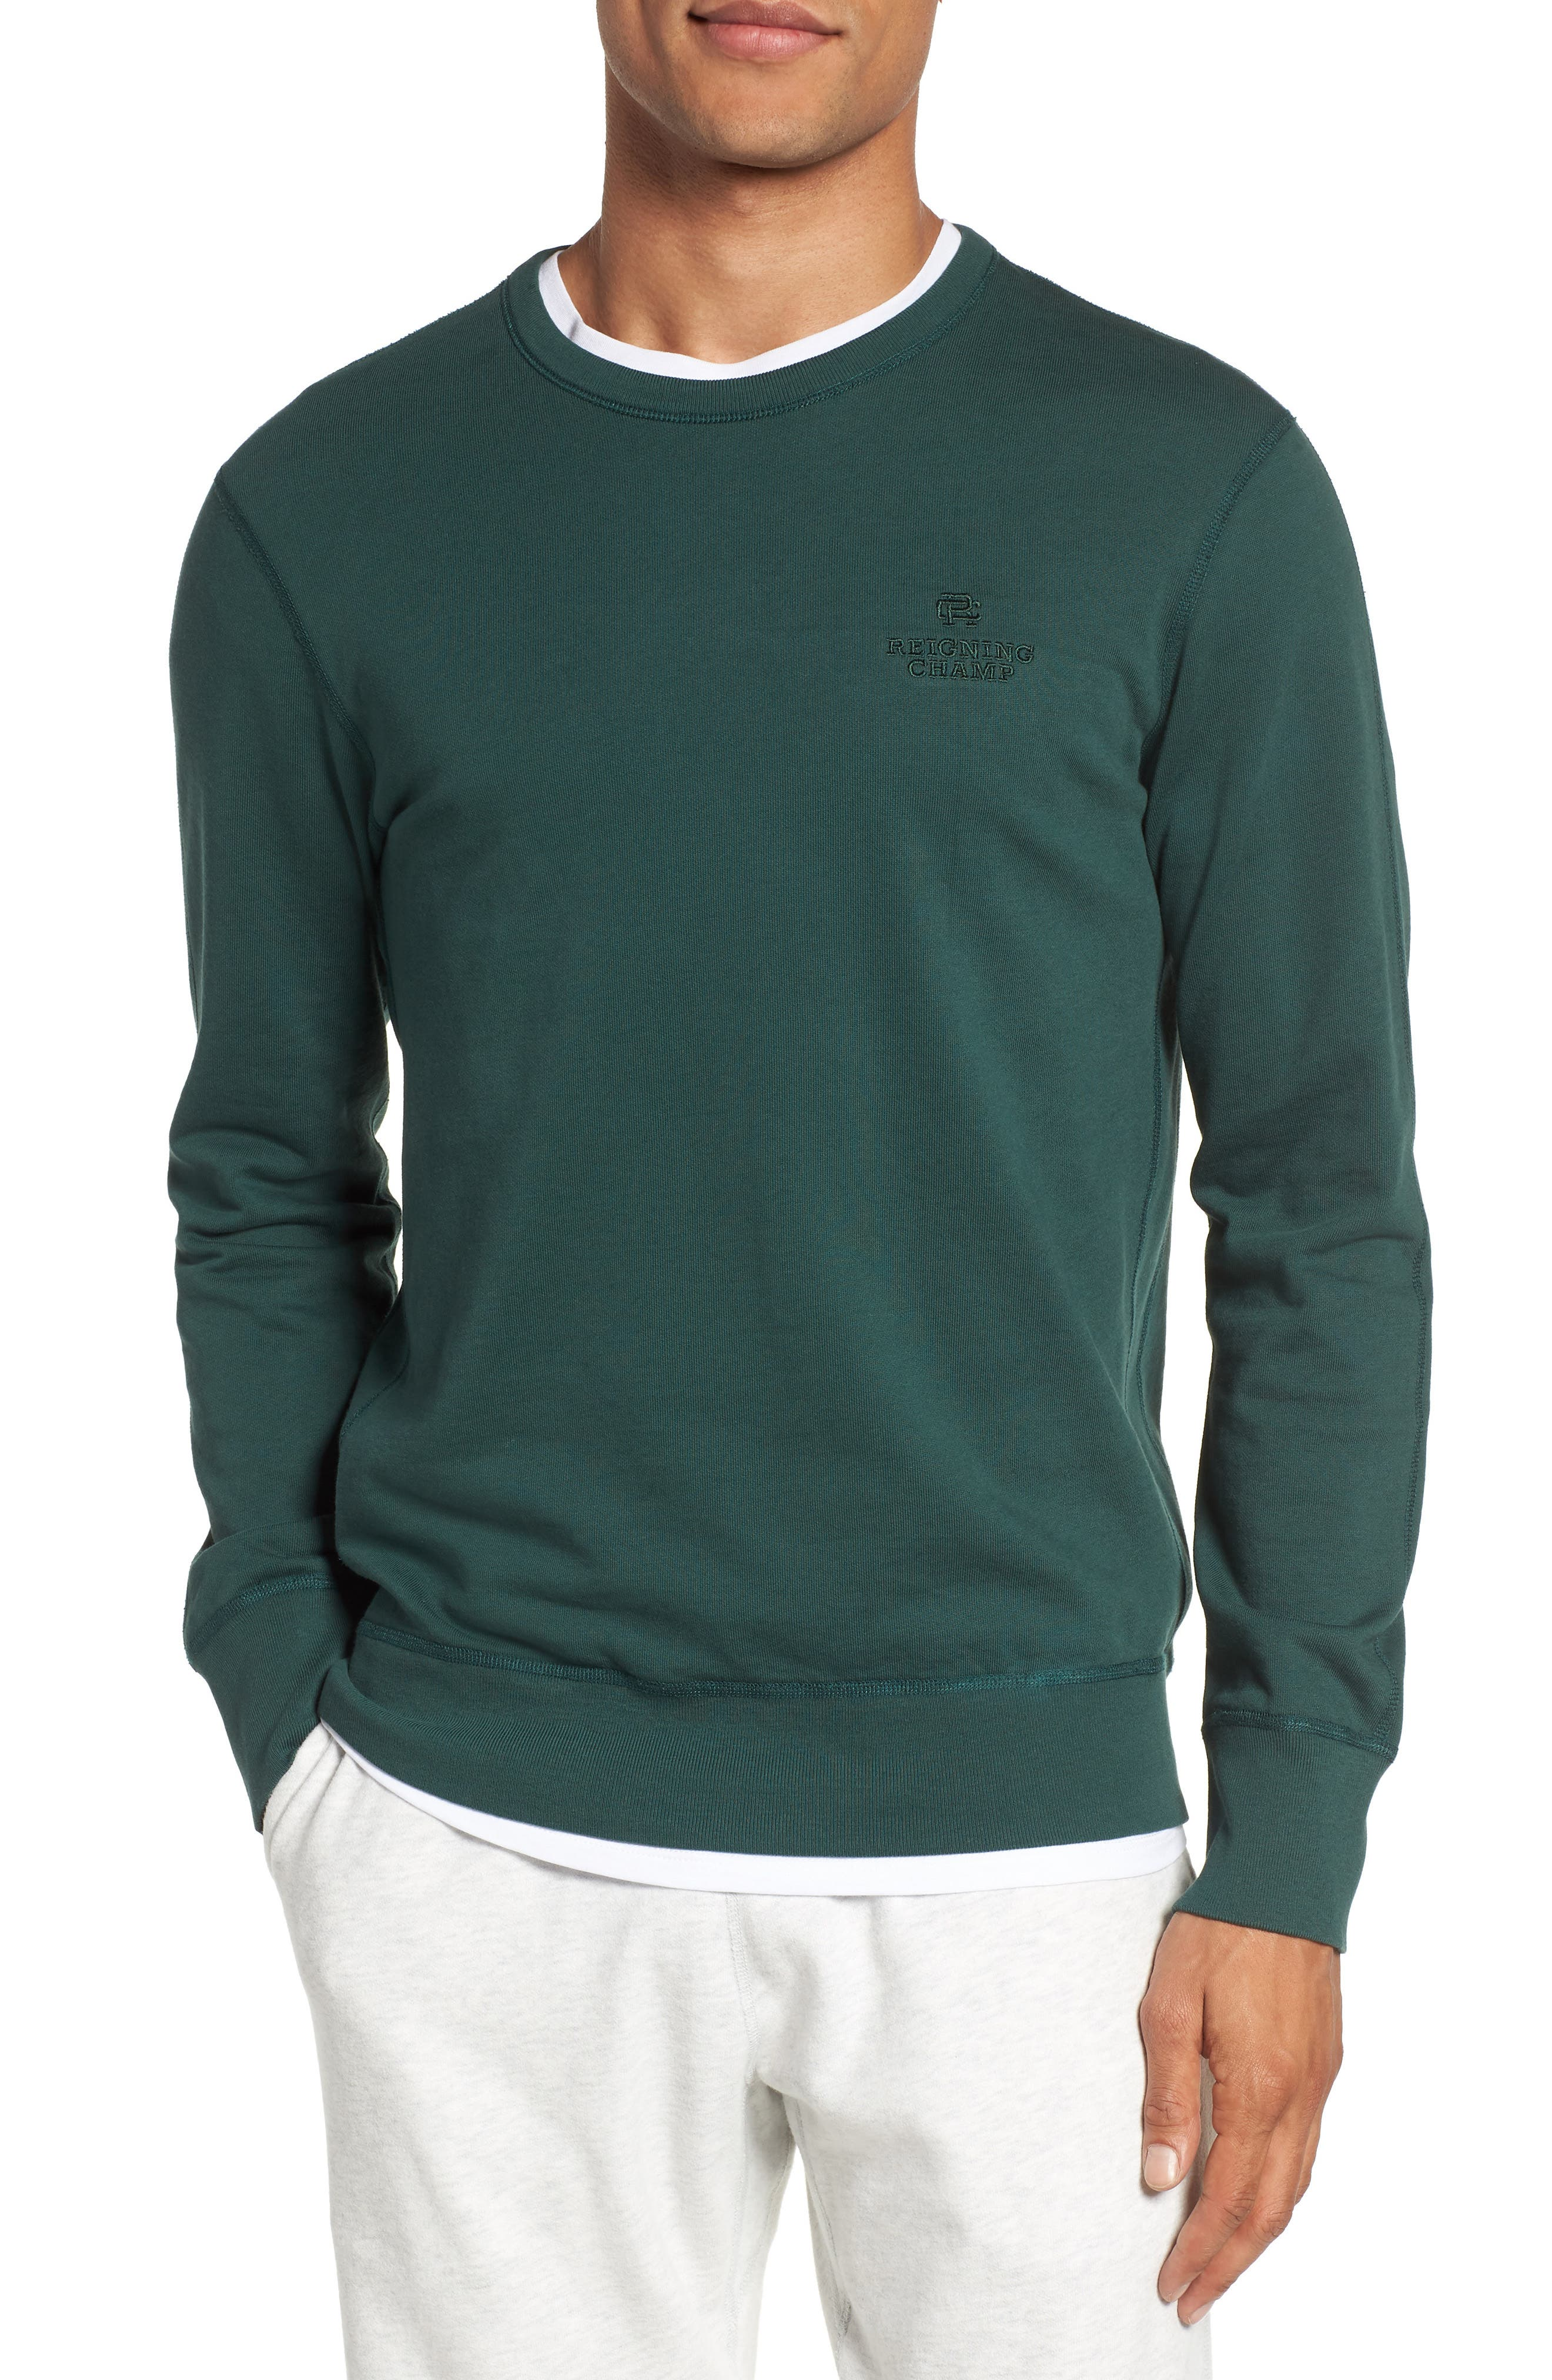 Embroidered Logo Crewneck Sweatshirt,                         Main,                         color, Court Green